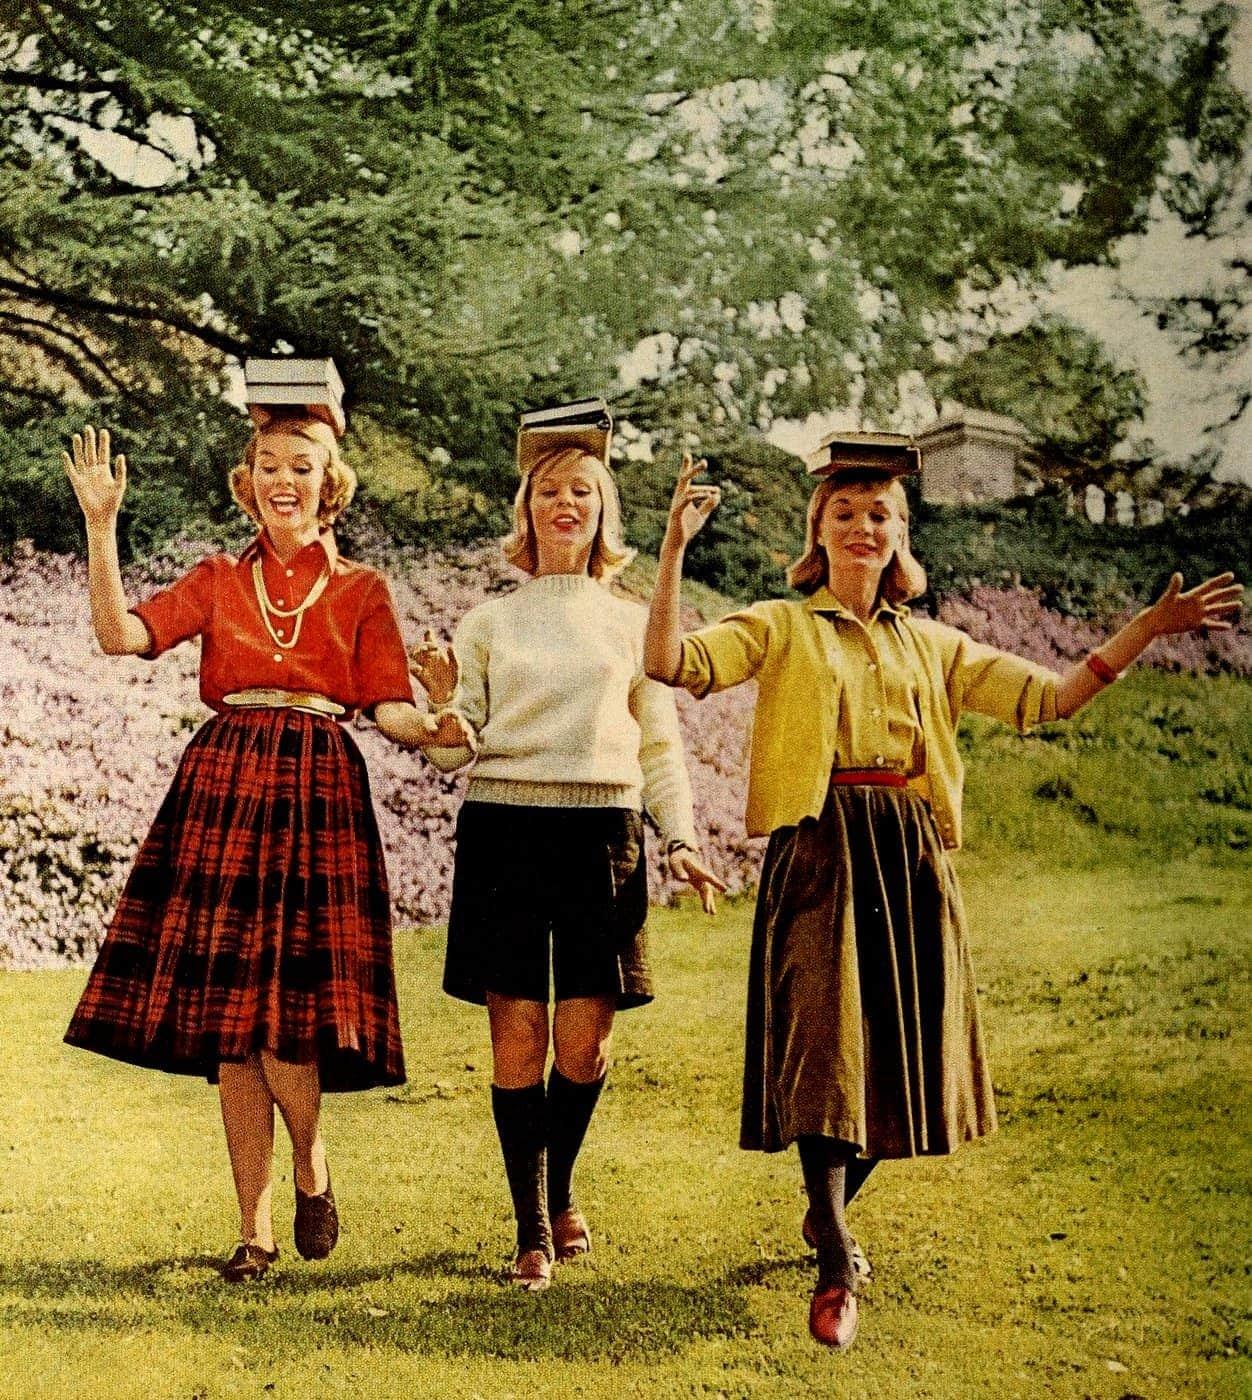 1950s teen culture Mrs. America: